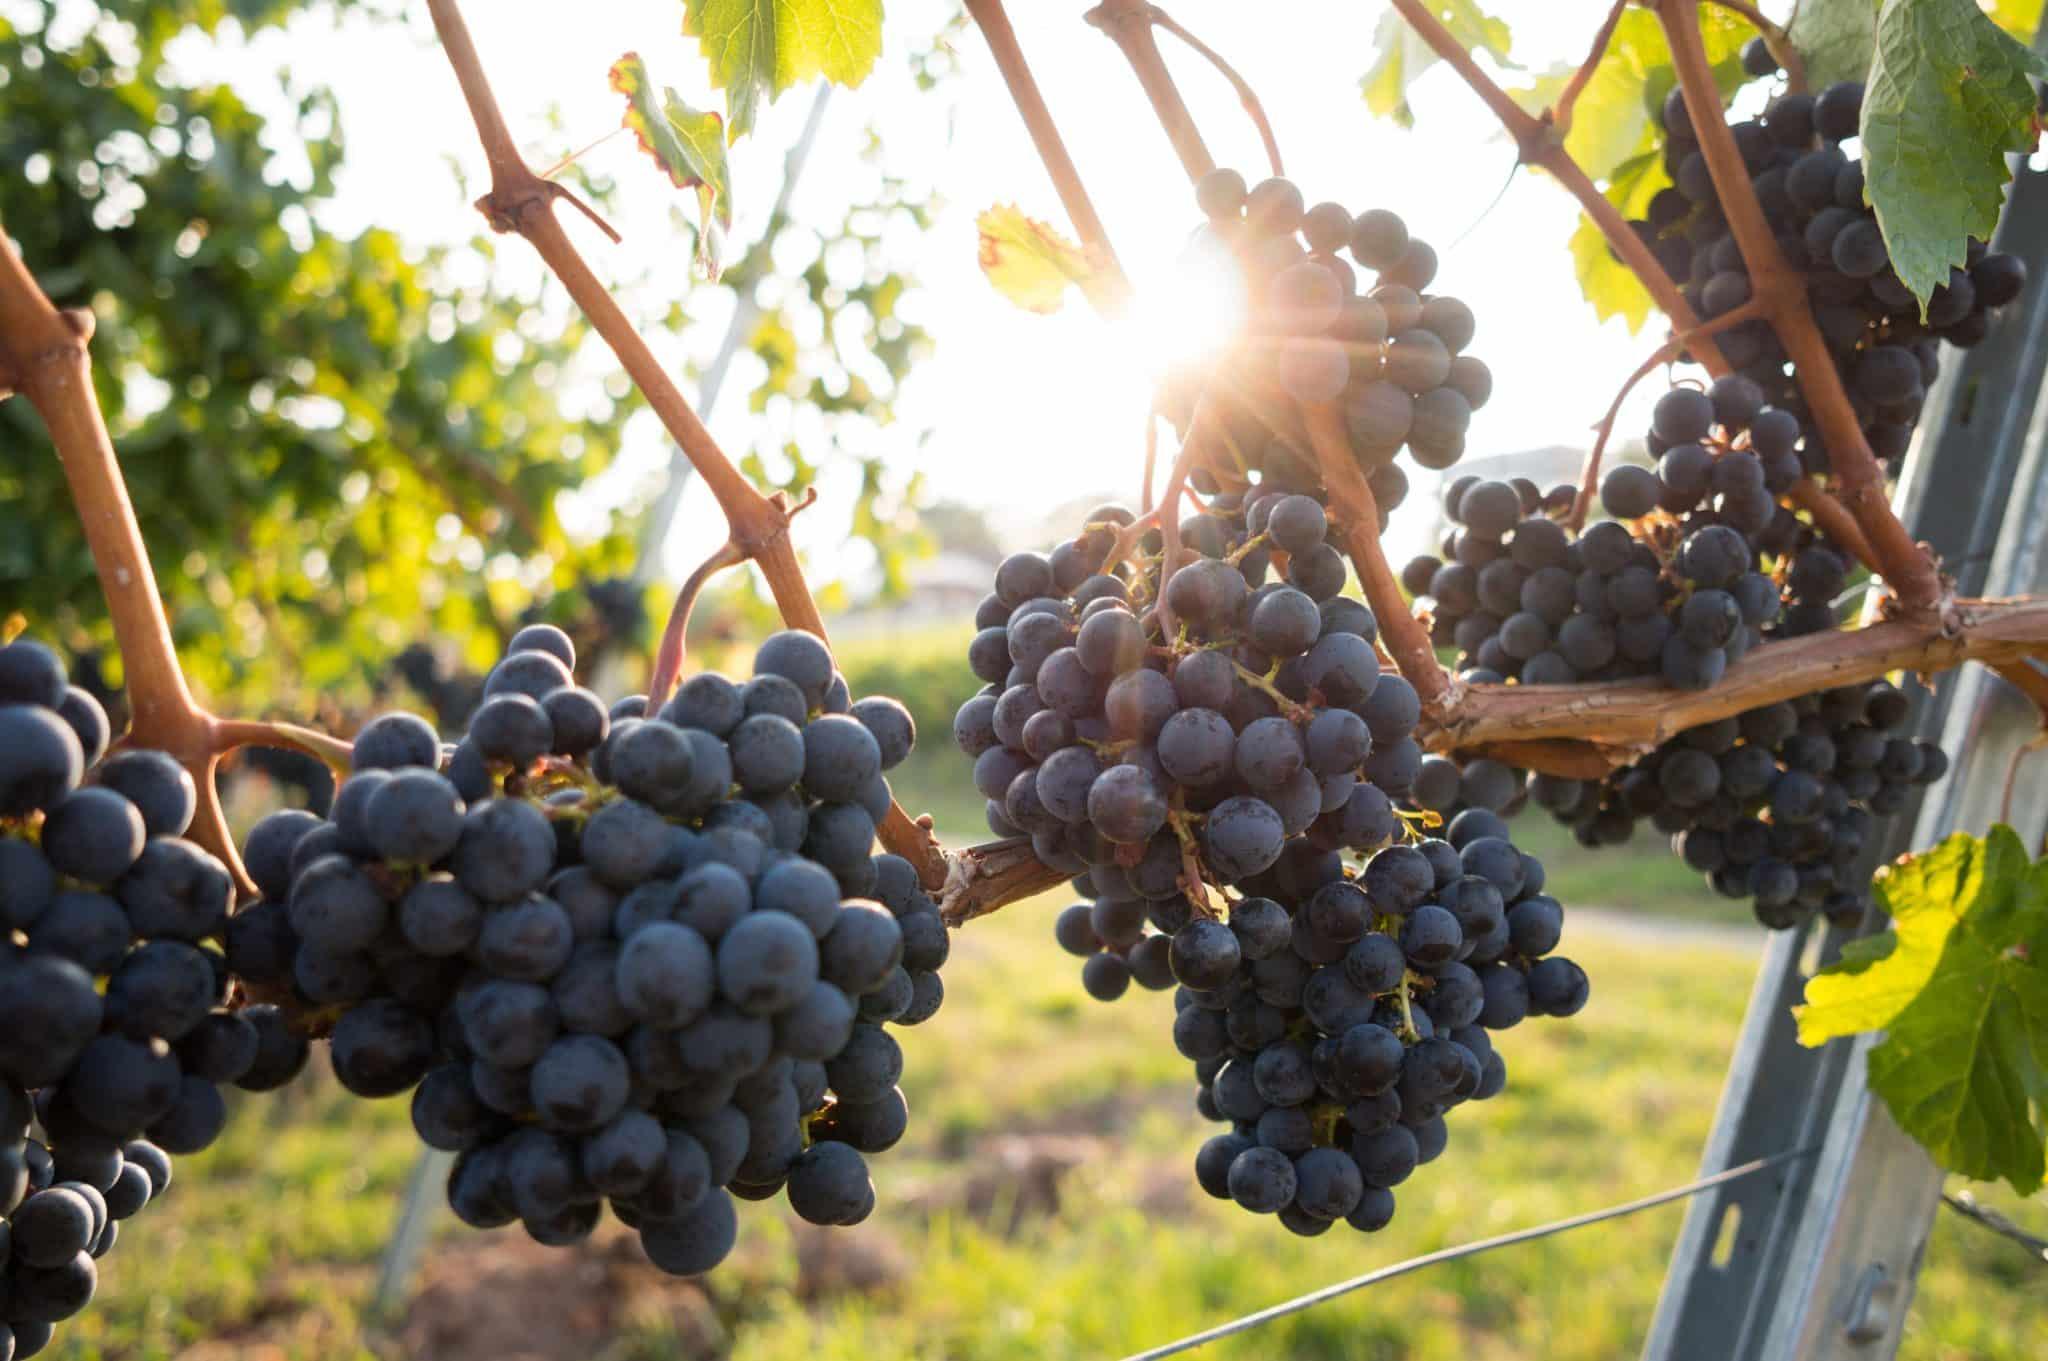 Purple grapes growing on vines on a vineyard